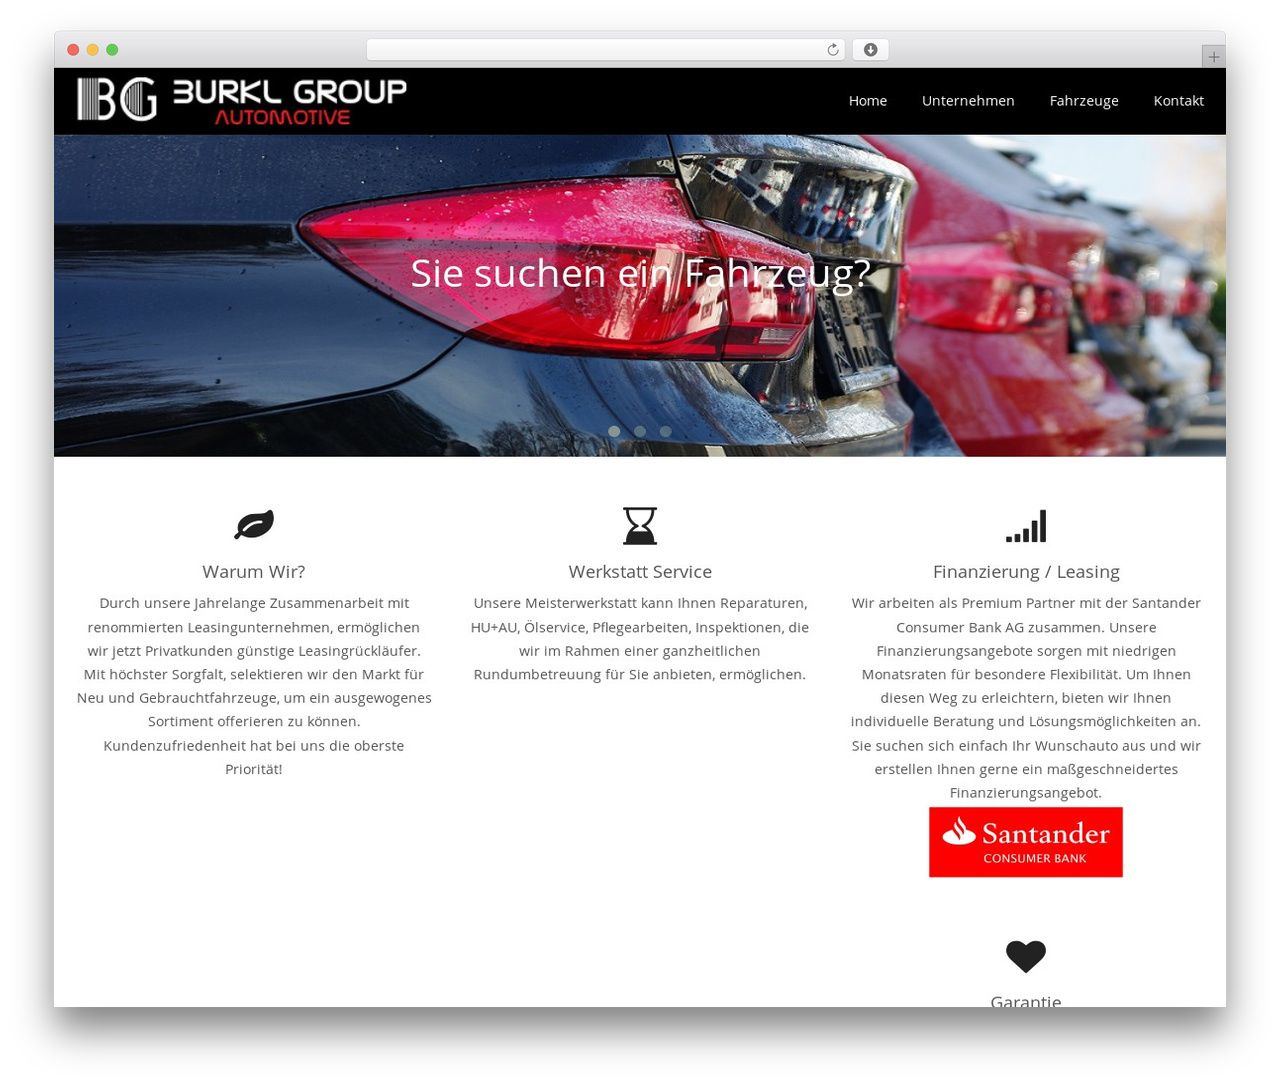 Onetone Wordpress Theme By Mageewp Burkl Group De In 2020 Best Free Wordpress Themes Free Wordpress Themes Beautiful Wordpress Themes